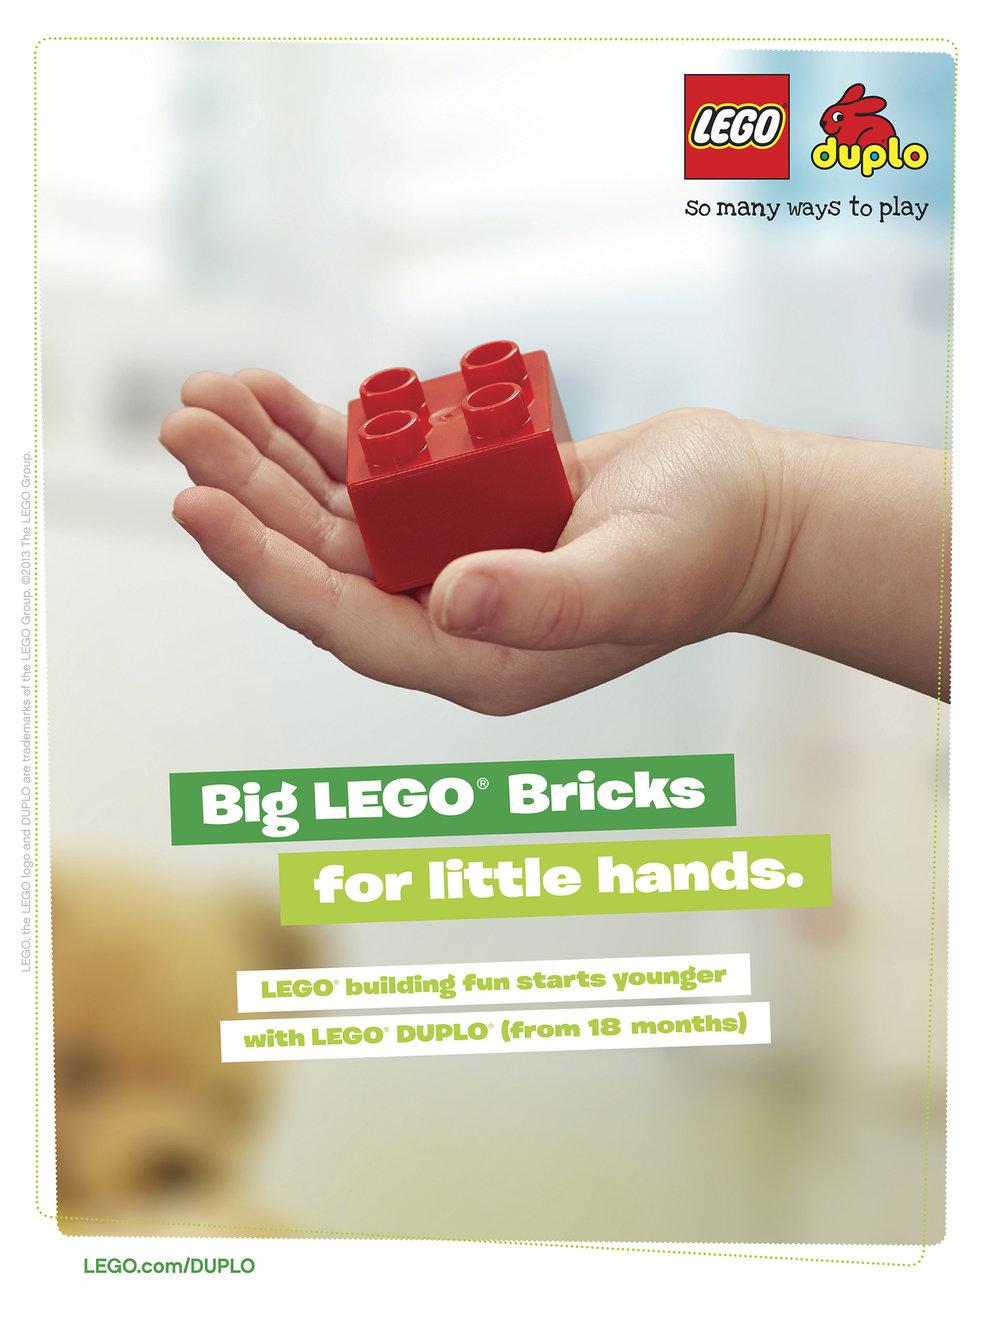 Brandee_LEGO_03.jpg